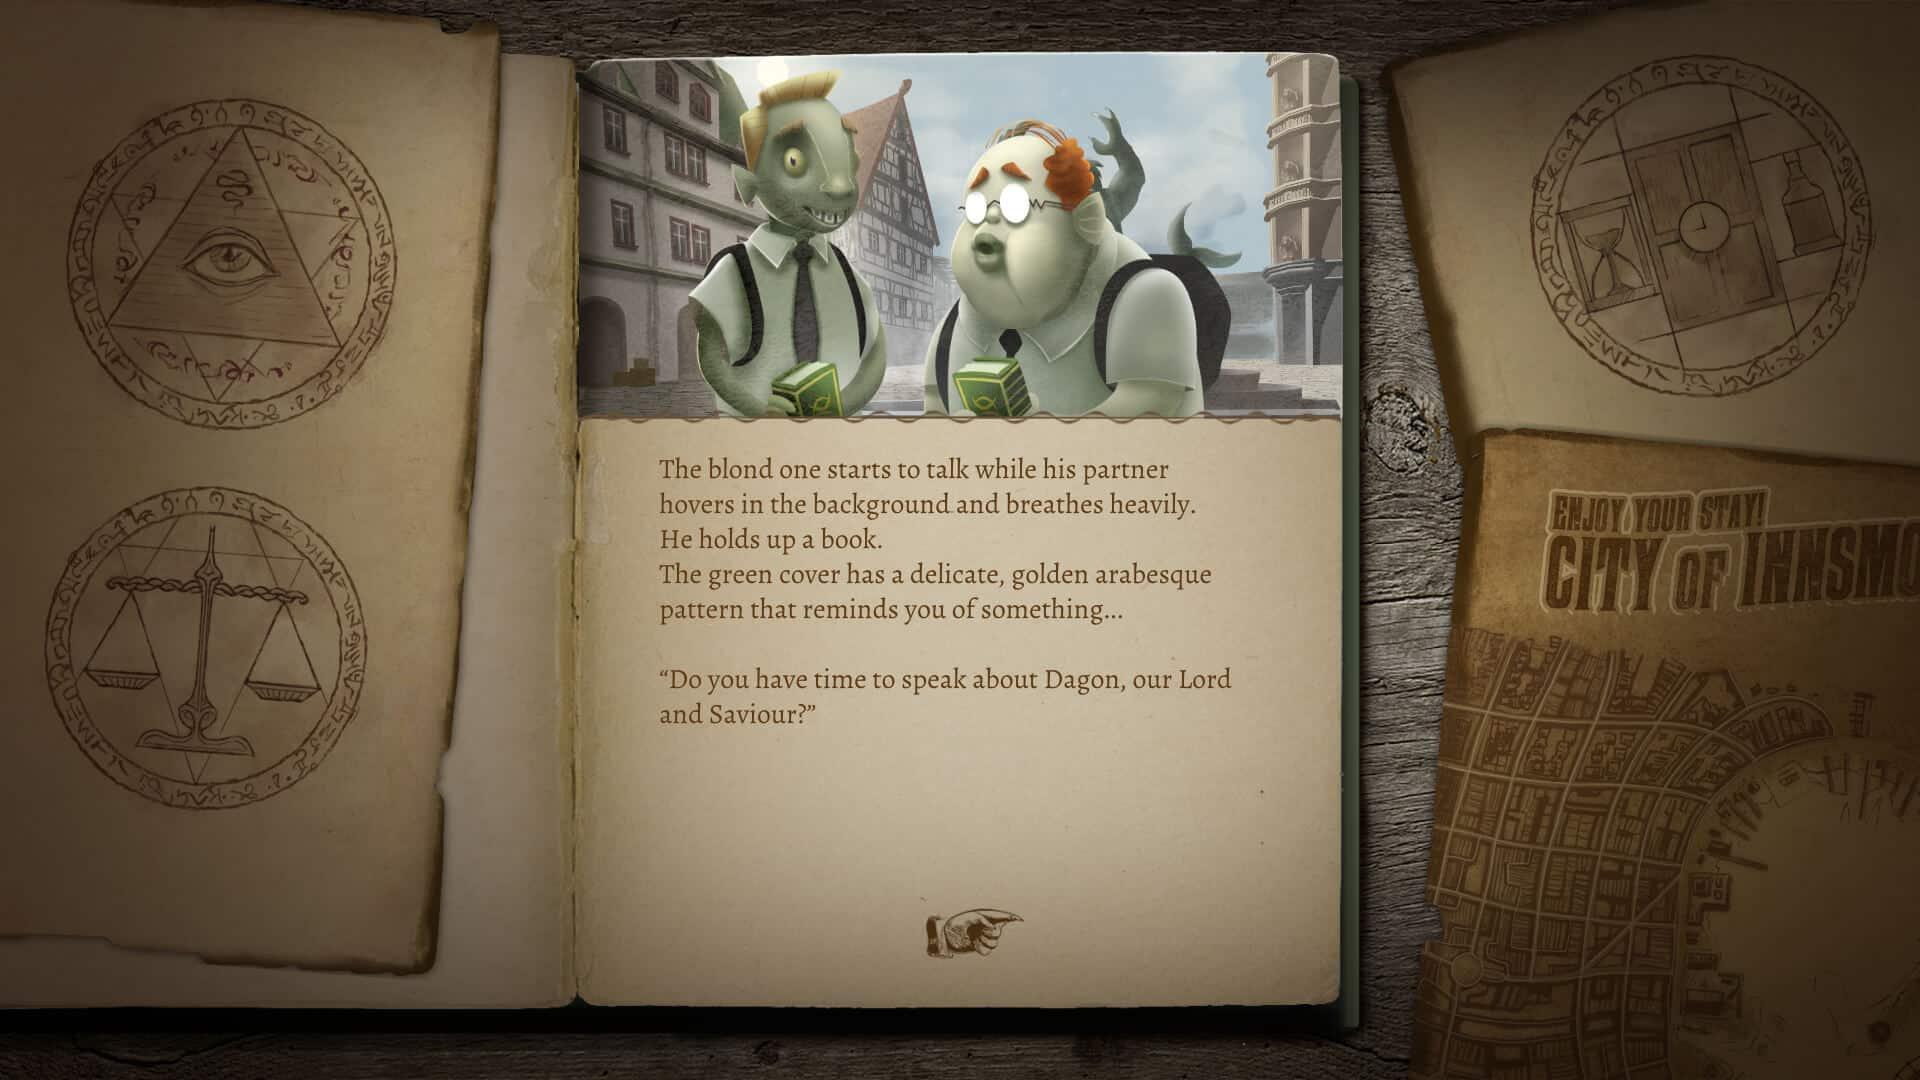 Lovecraftian interative horror story games support screenshot 02